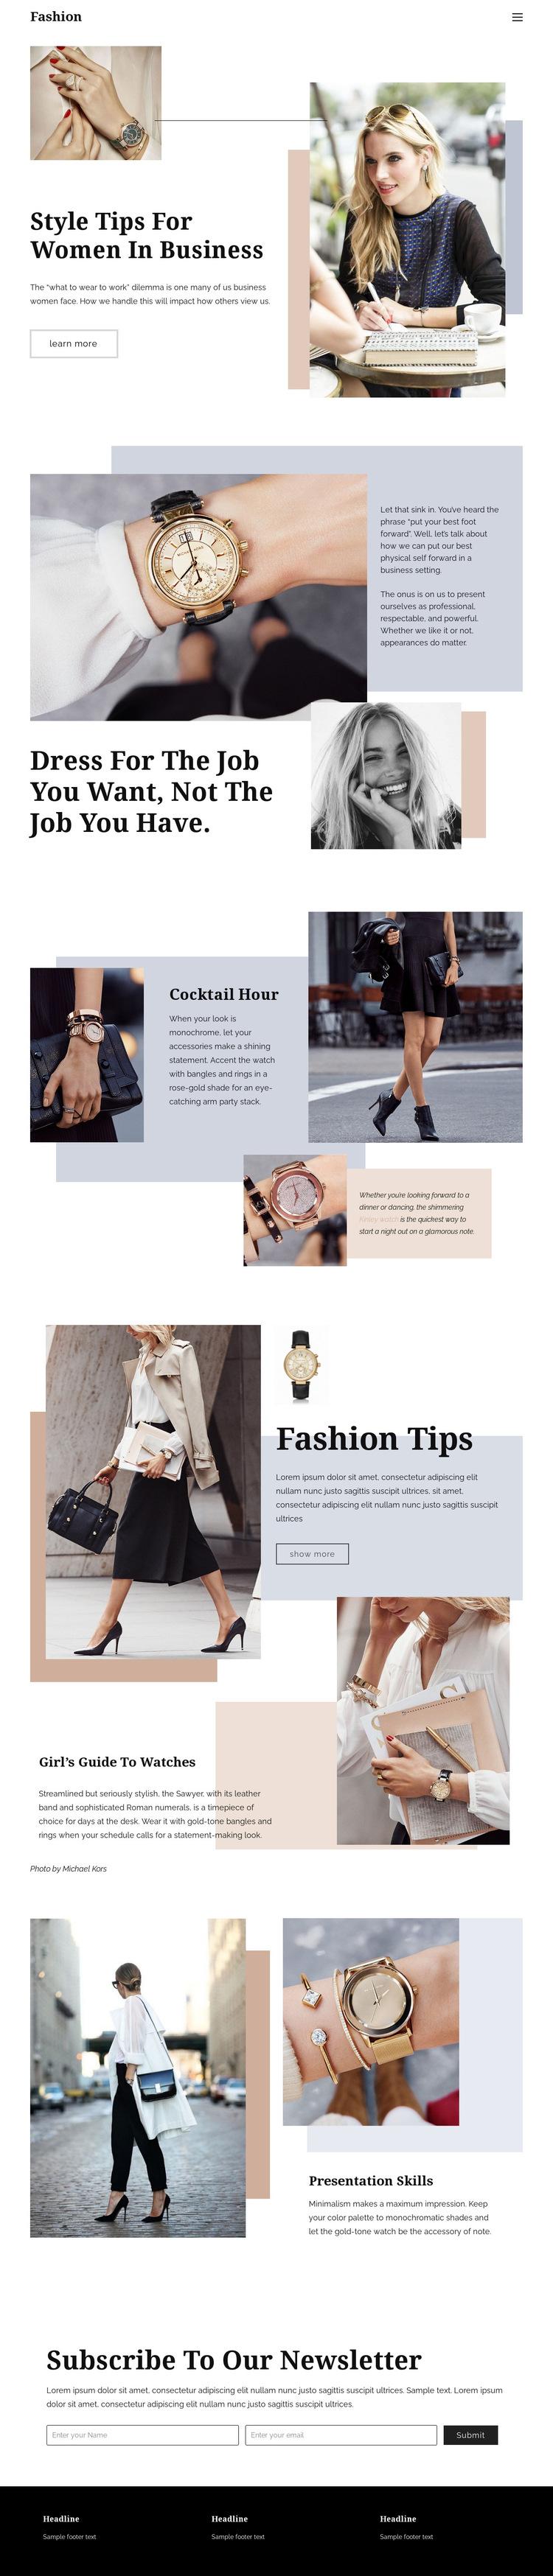 Fashion tips HTML5 Template